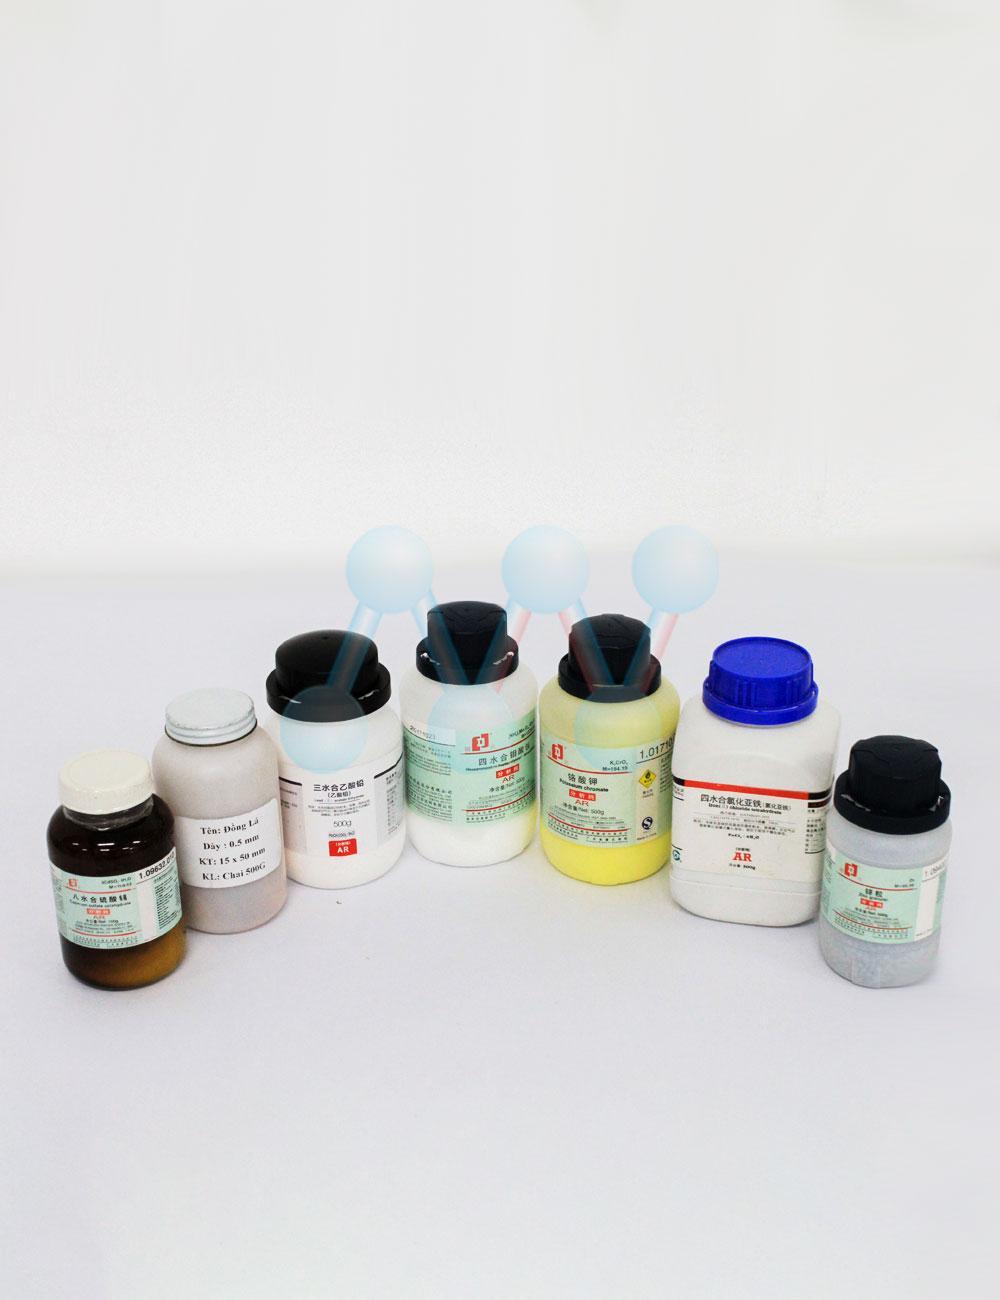 Acid Formic HCOOH